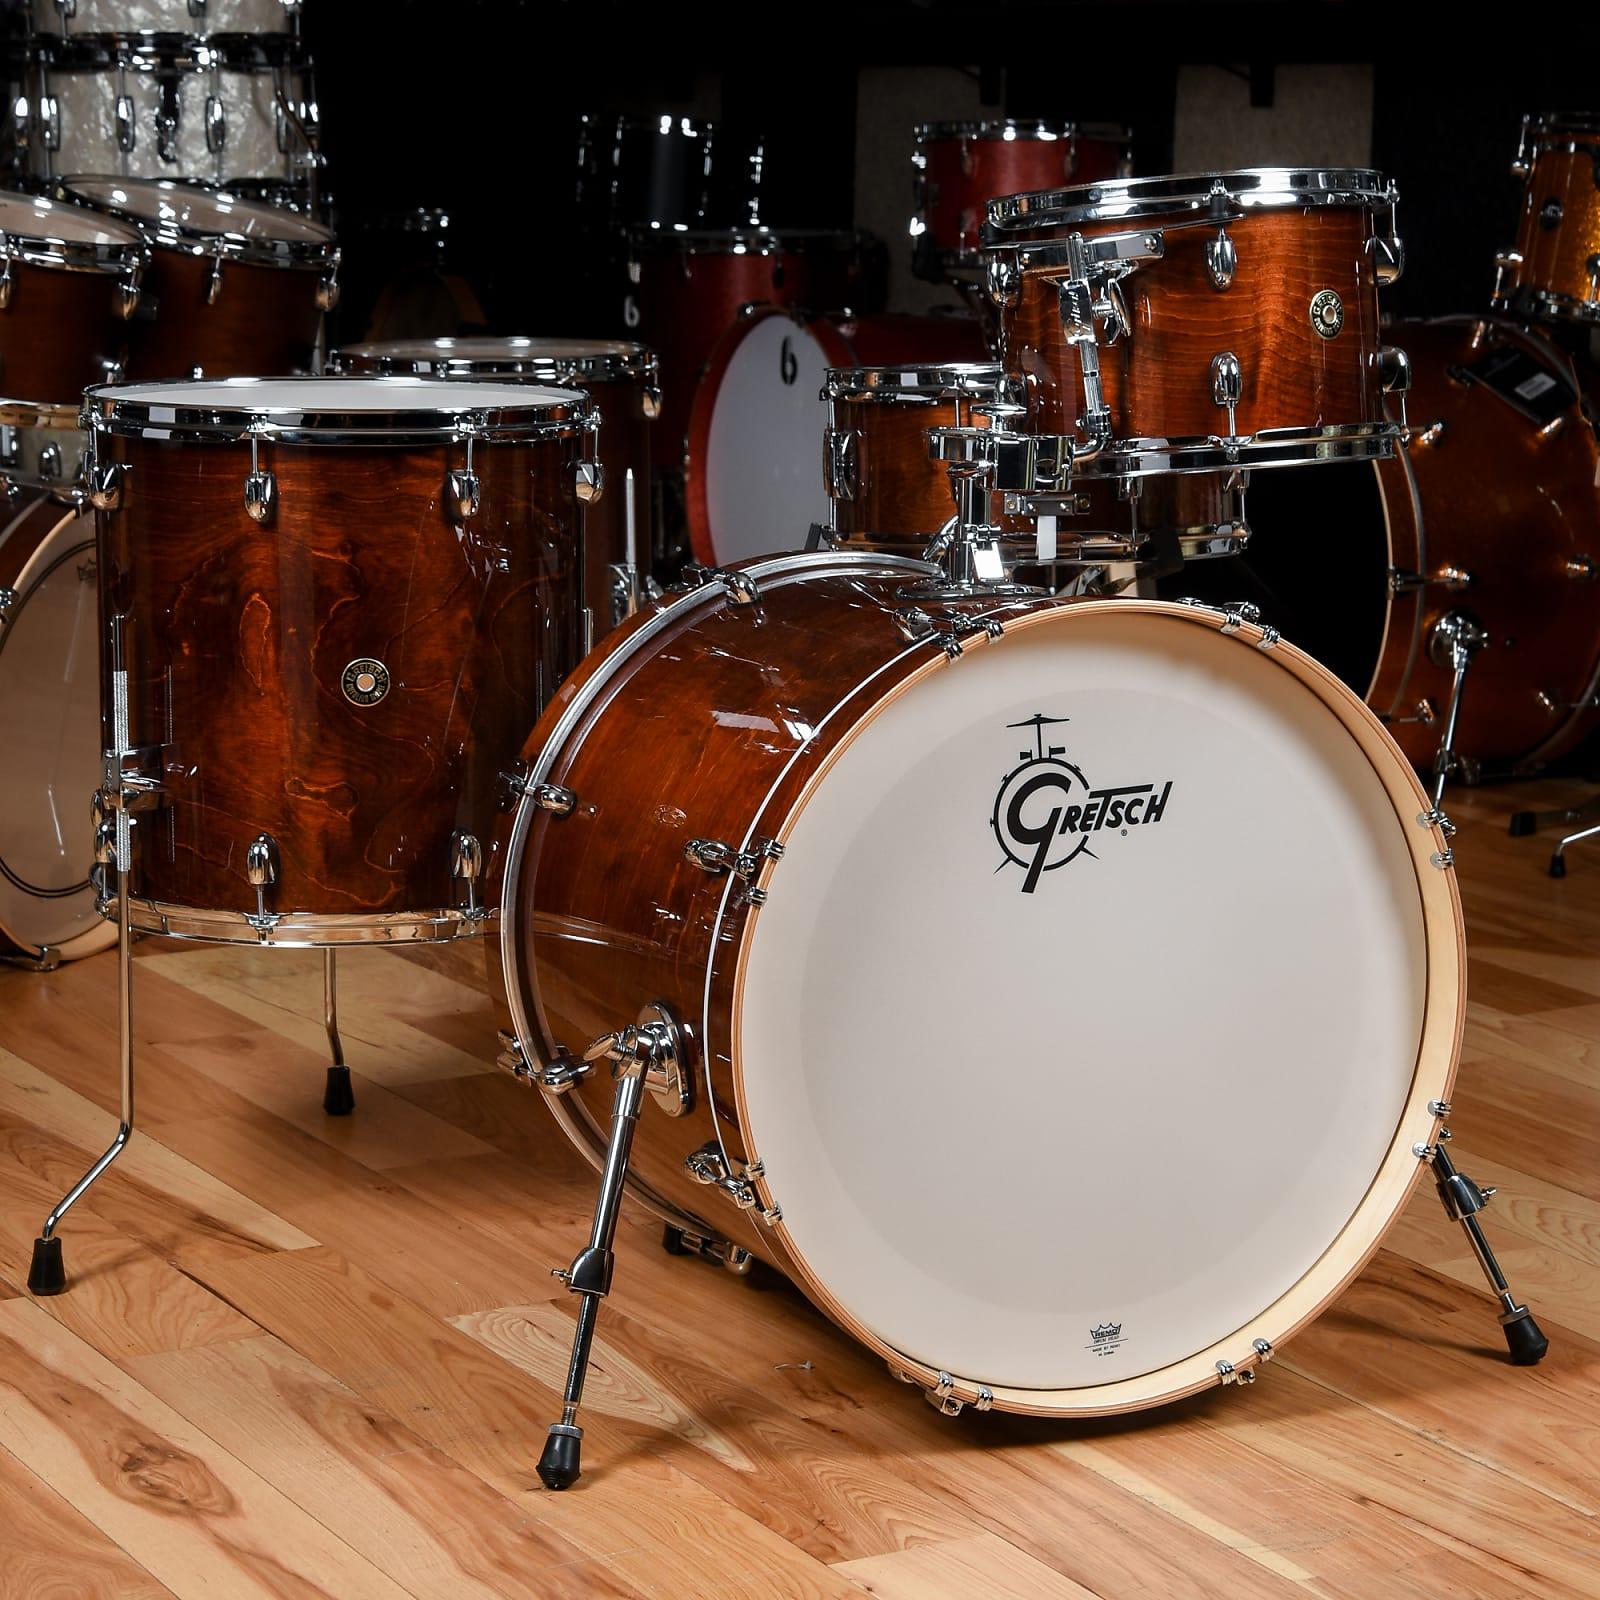 gretsch catalina maple rock 12 16 22 6x14 4pc drum kit walnut glaze. Black Bedroom Furniture Sets. Home Design Ideas